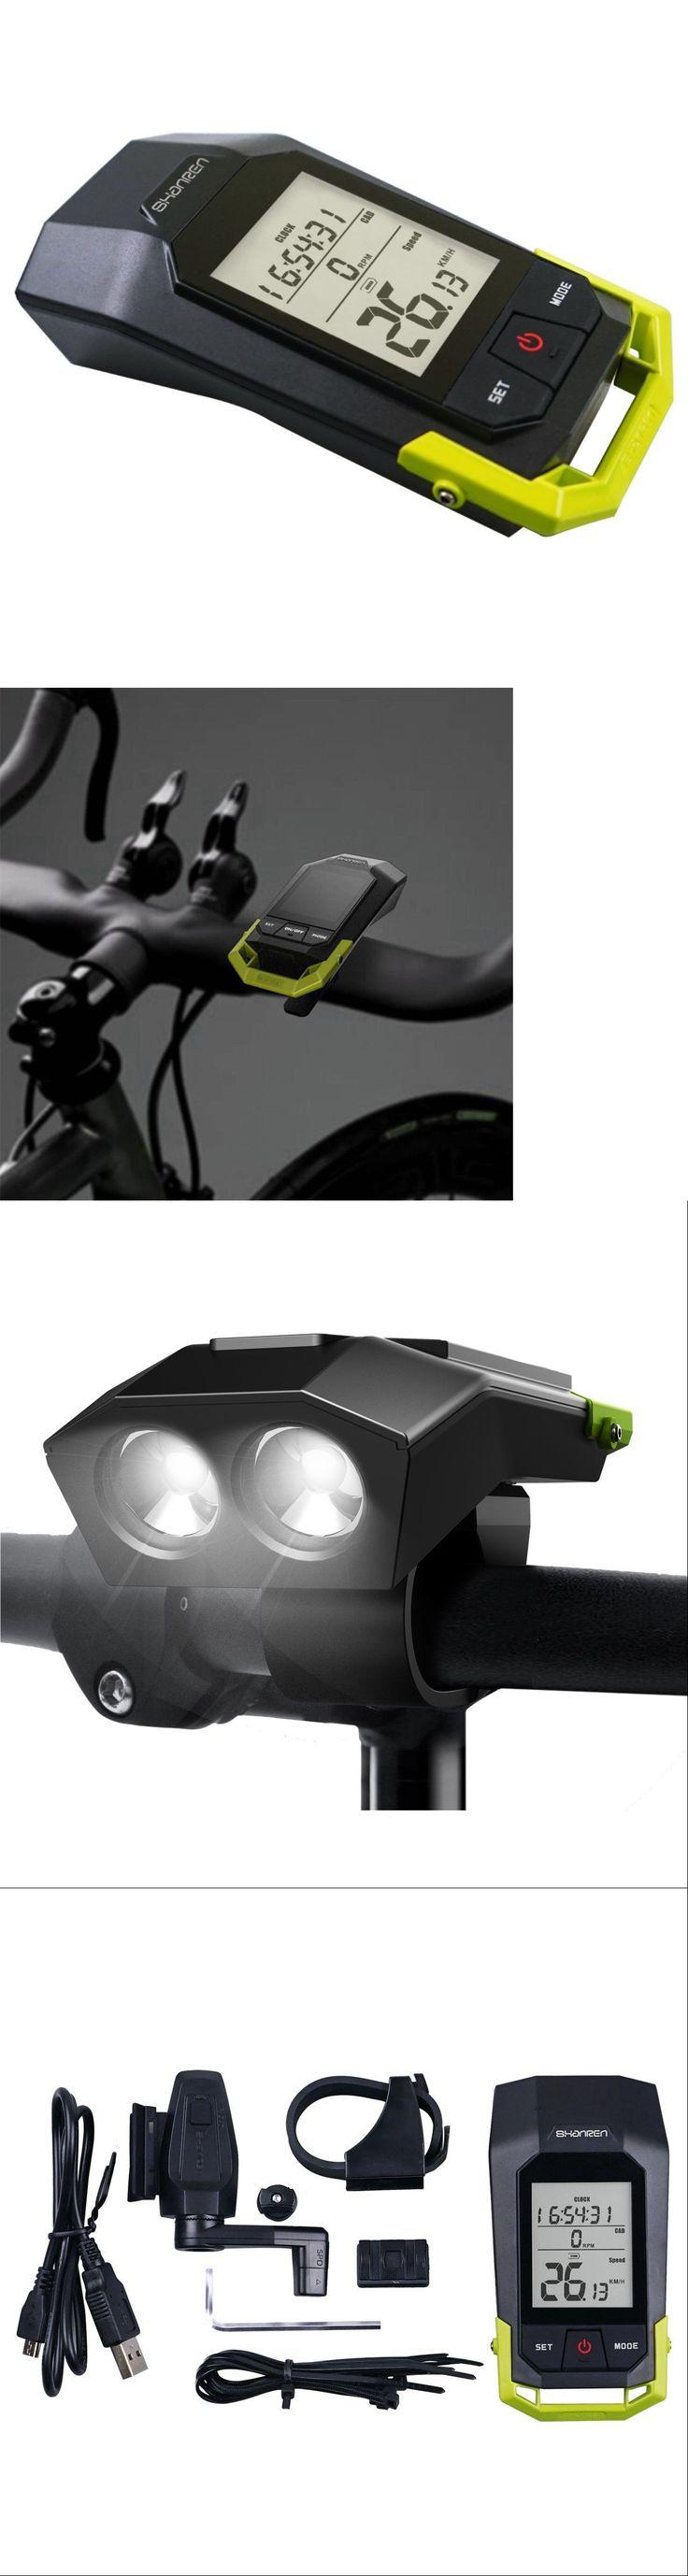 Cycle Computers and GPS 30108: Shanren Raptor Ii Bike Computer, Cadence Sensor Speedometer Odometer, Night Lite -> BUY IT NOW ONLY: $47.49 on eBay!